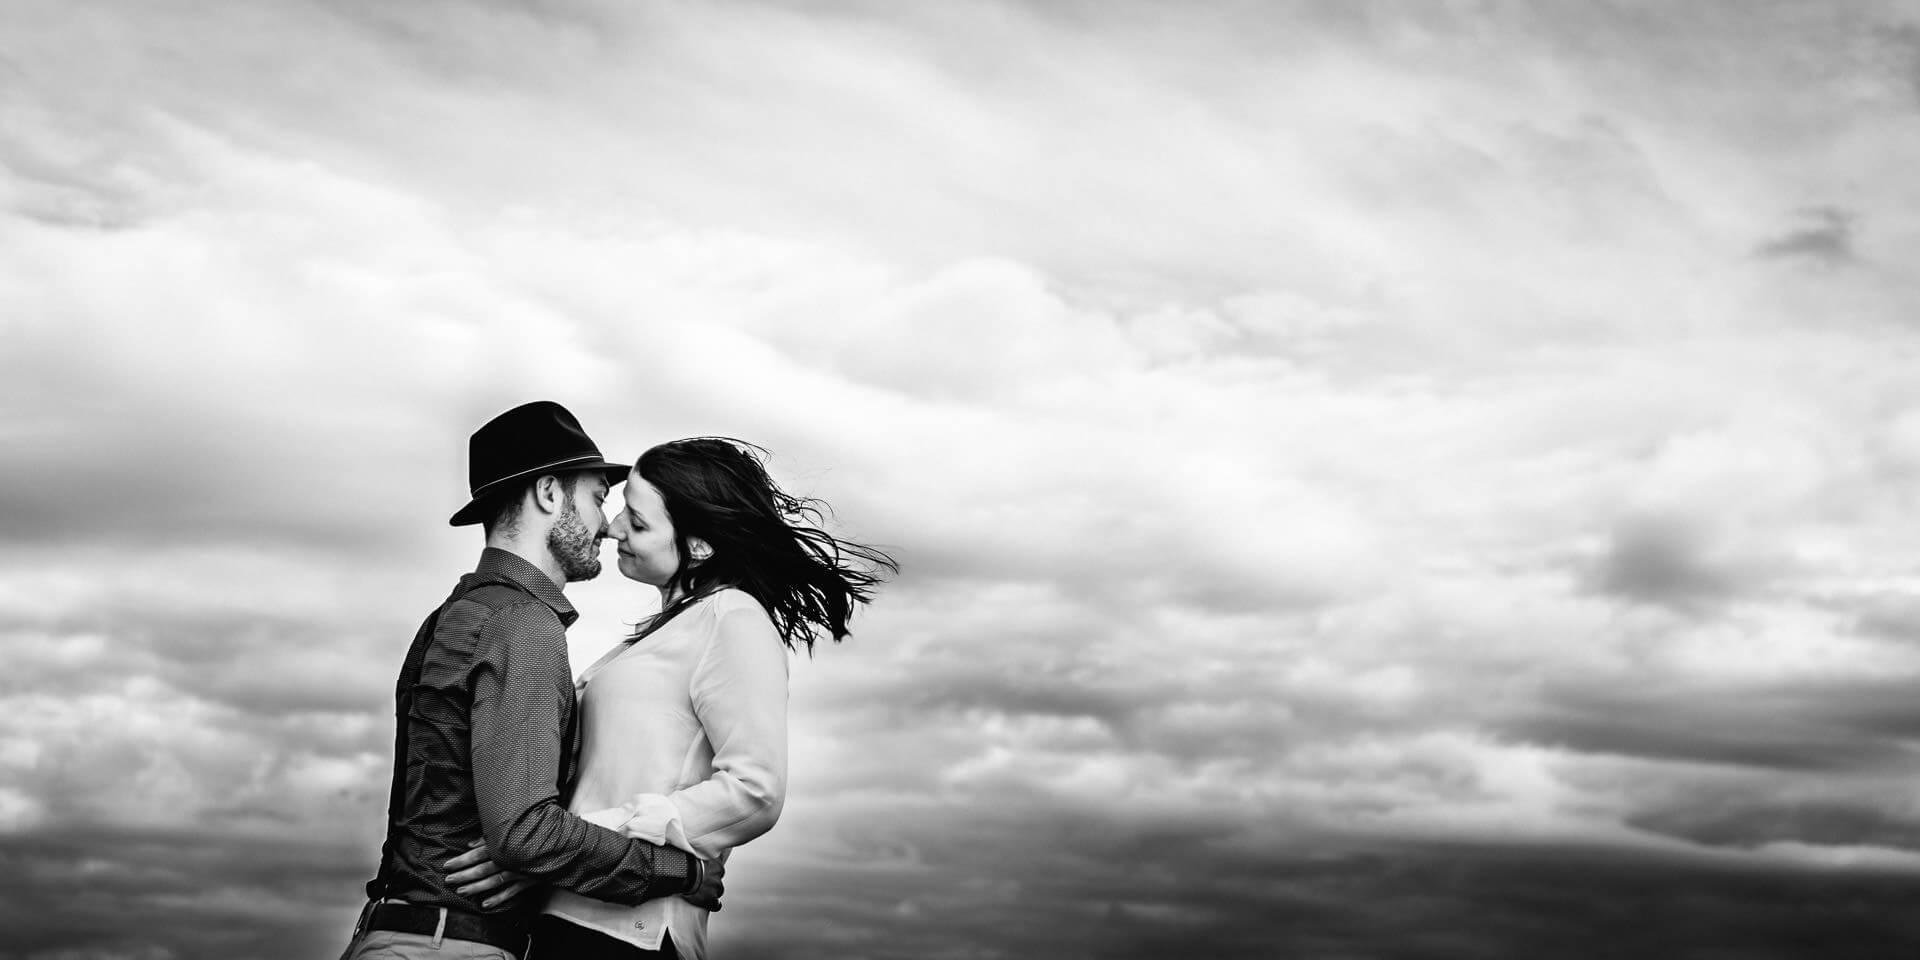 photographe mariage seance d'engagment studiograou frontignan